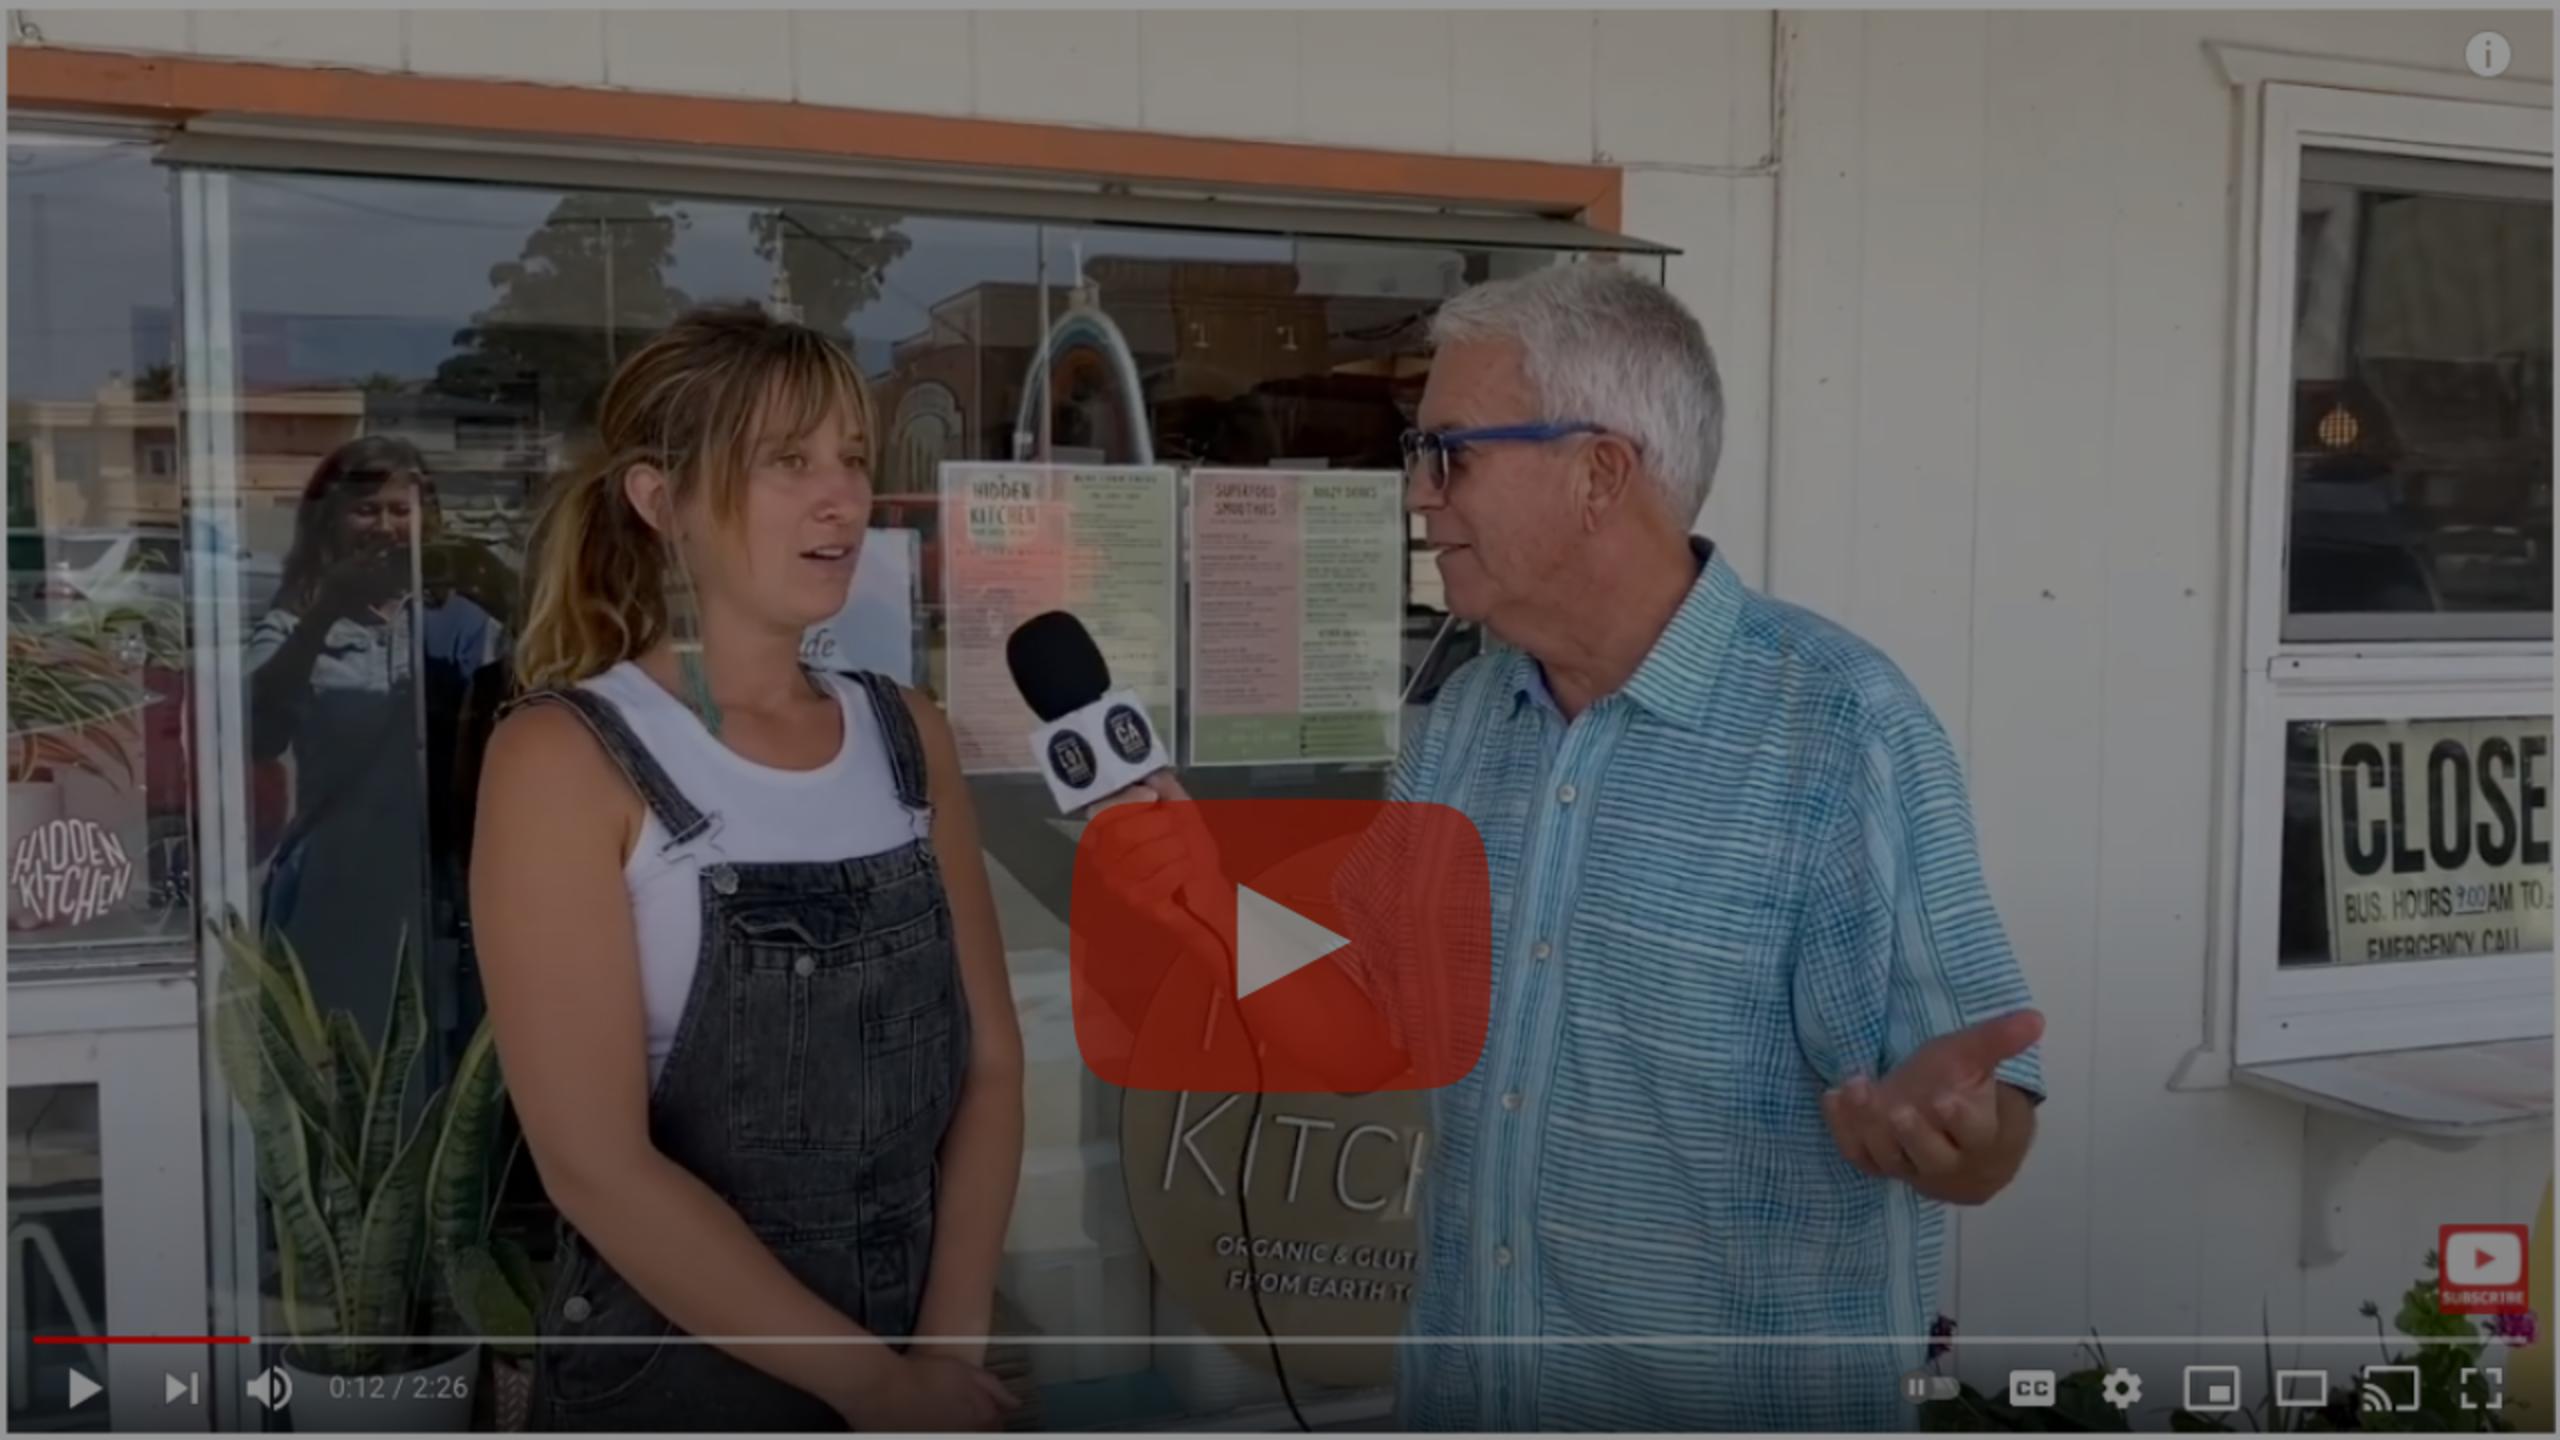 Best of California show features Hidden Kitchen in Cayucos